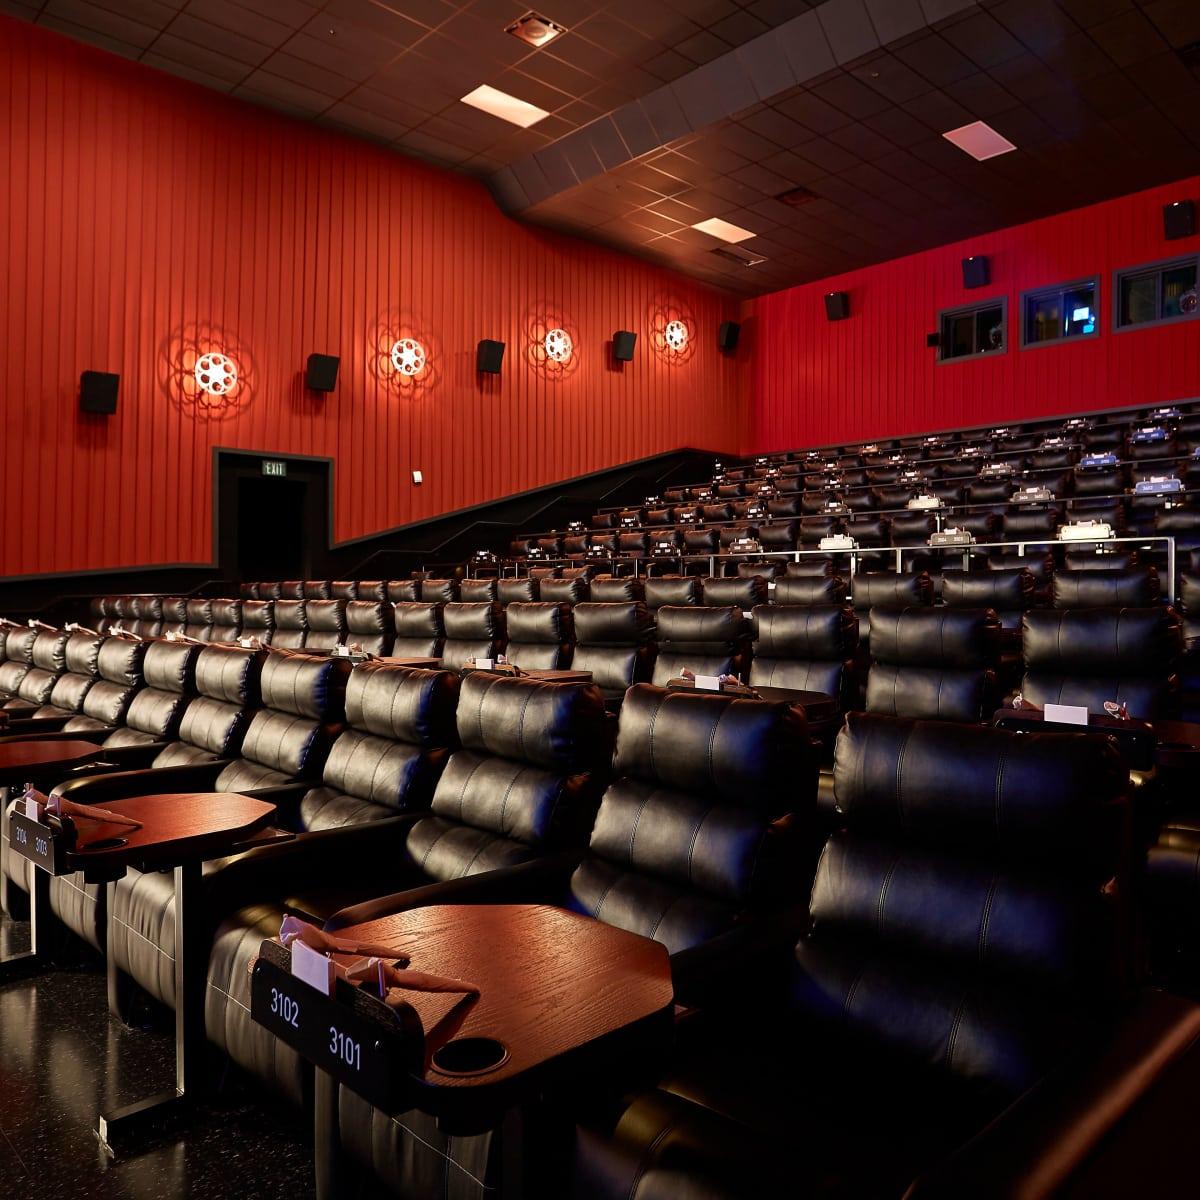 Houston, Alamo Drafthouse Cinema Katy, Jan 2017, interior of auditorium